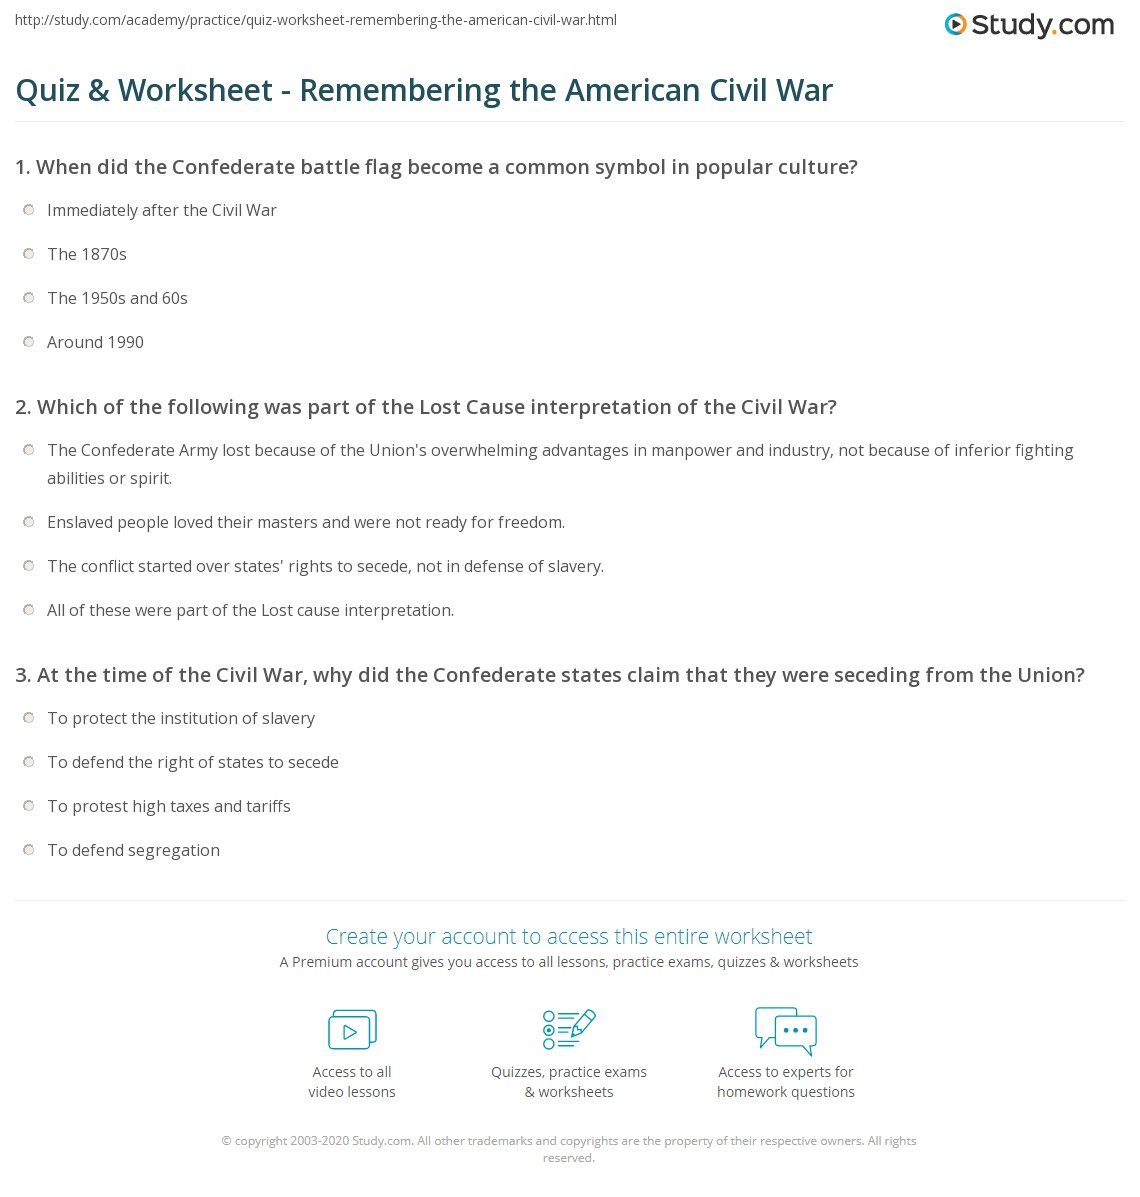 Worksheets Civil War Worksheets quiz worksheet remembering the american civil war study com print legacy of worksheet